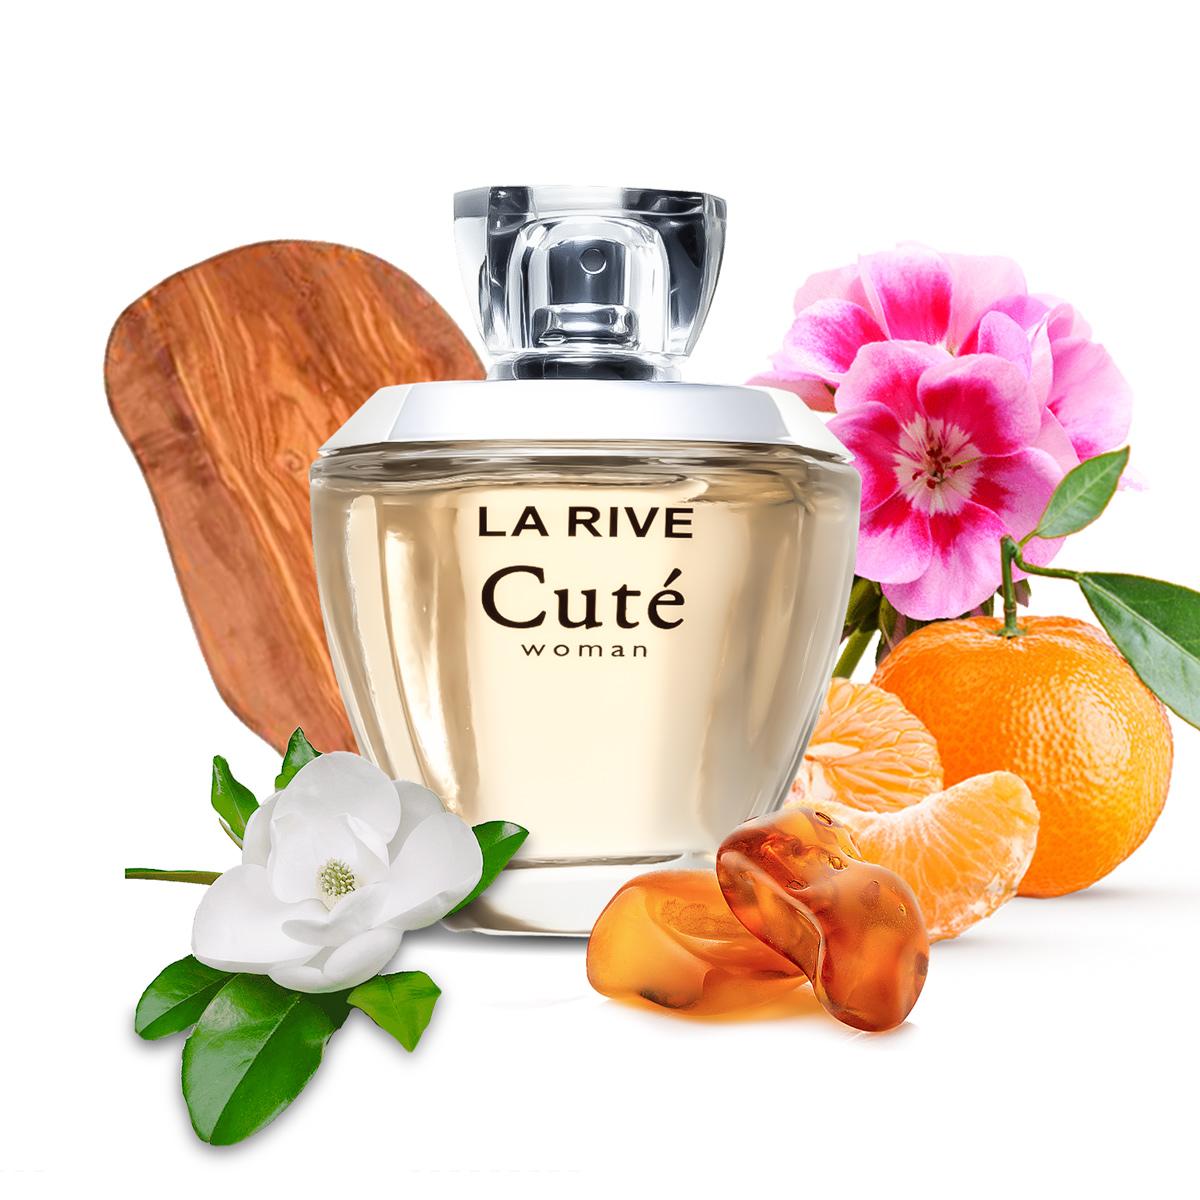 Kit 2 Perfumes Importados Cash Man e Cuté La Rive